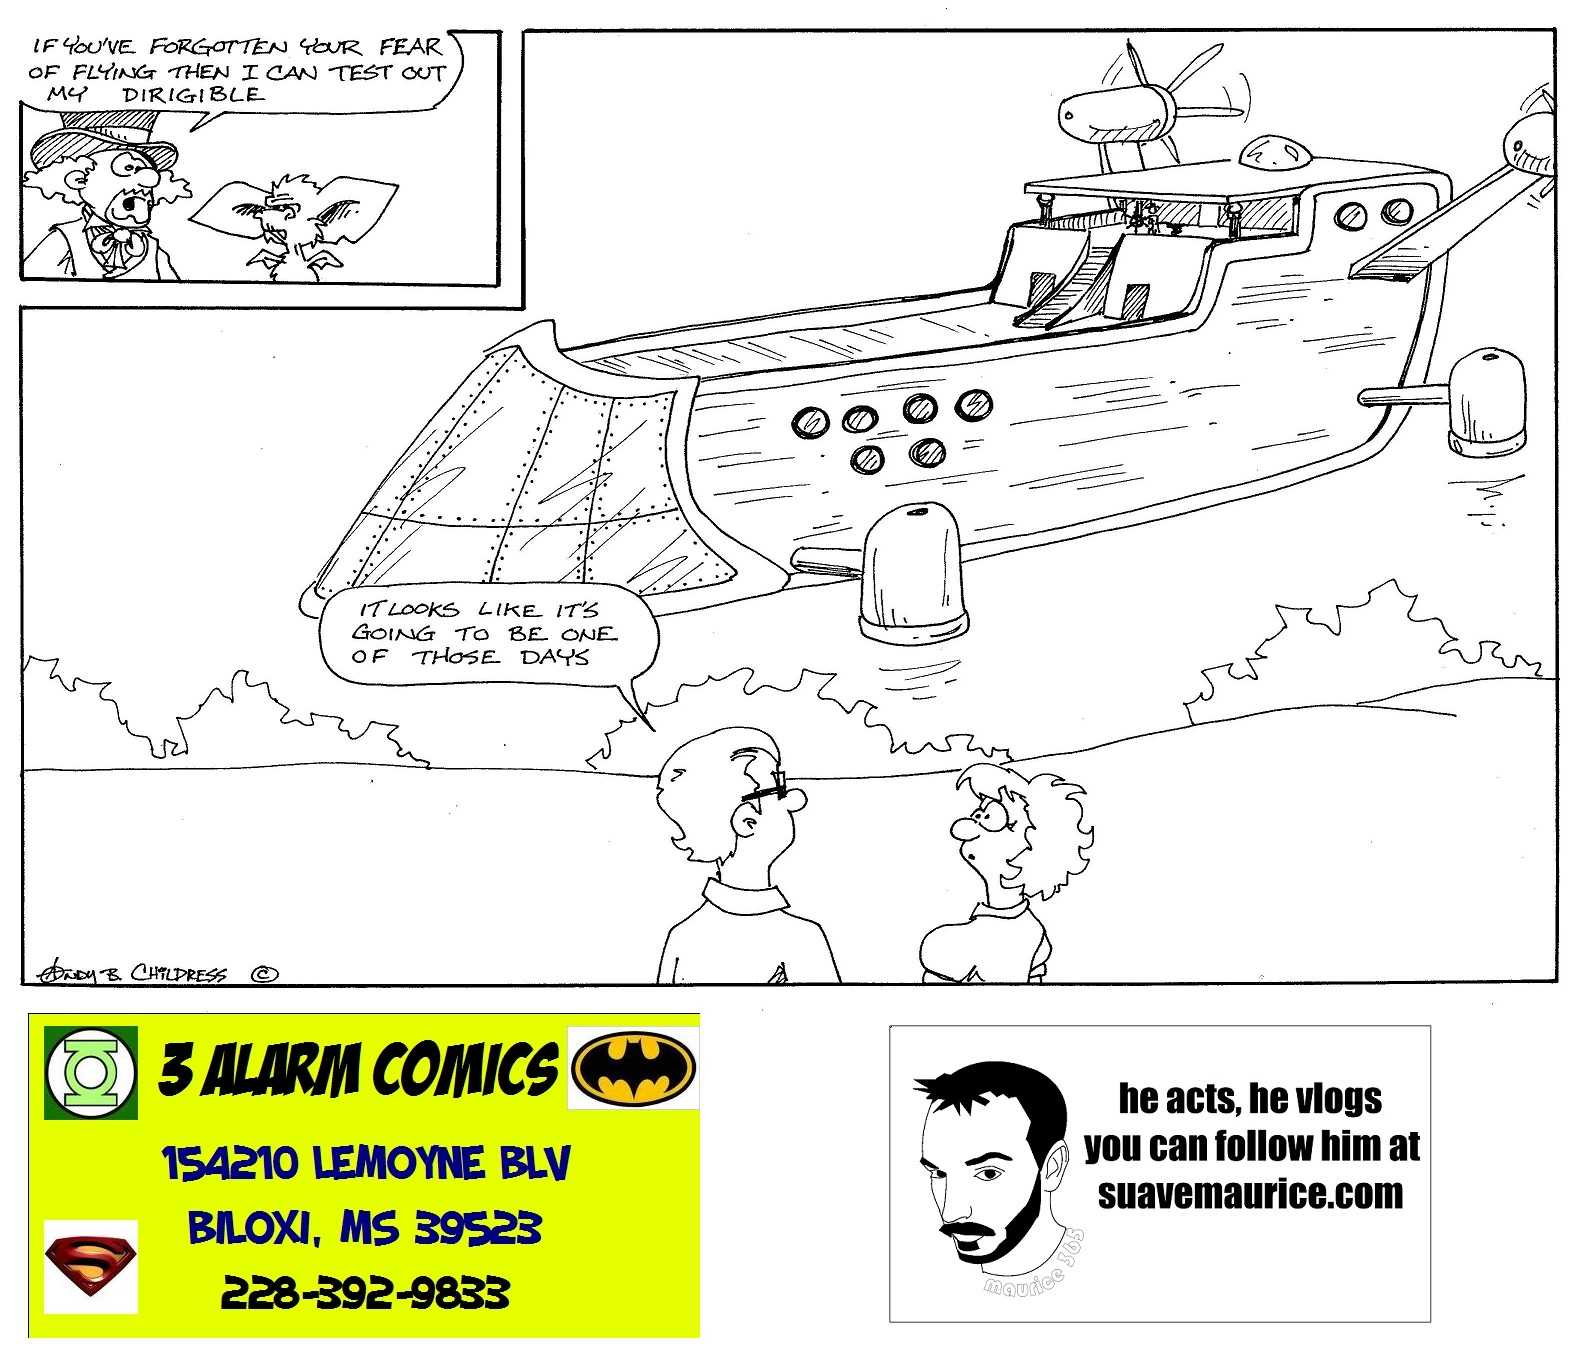 High Resolution Wallpaper | Three Alarm Comics 1576x1364 px